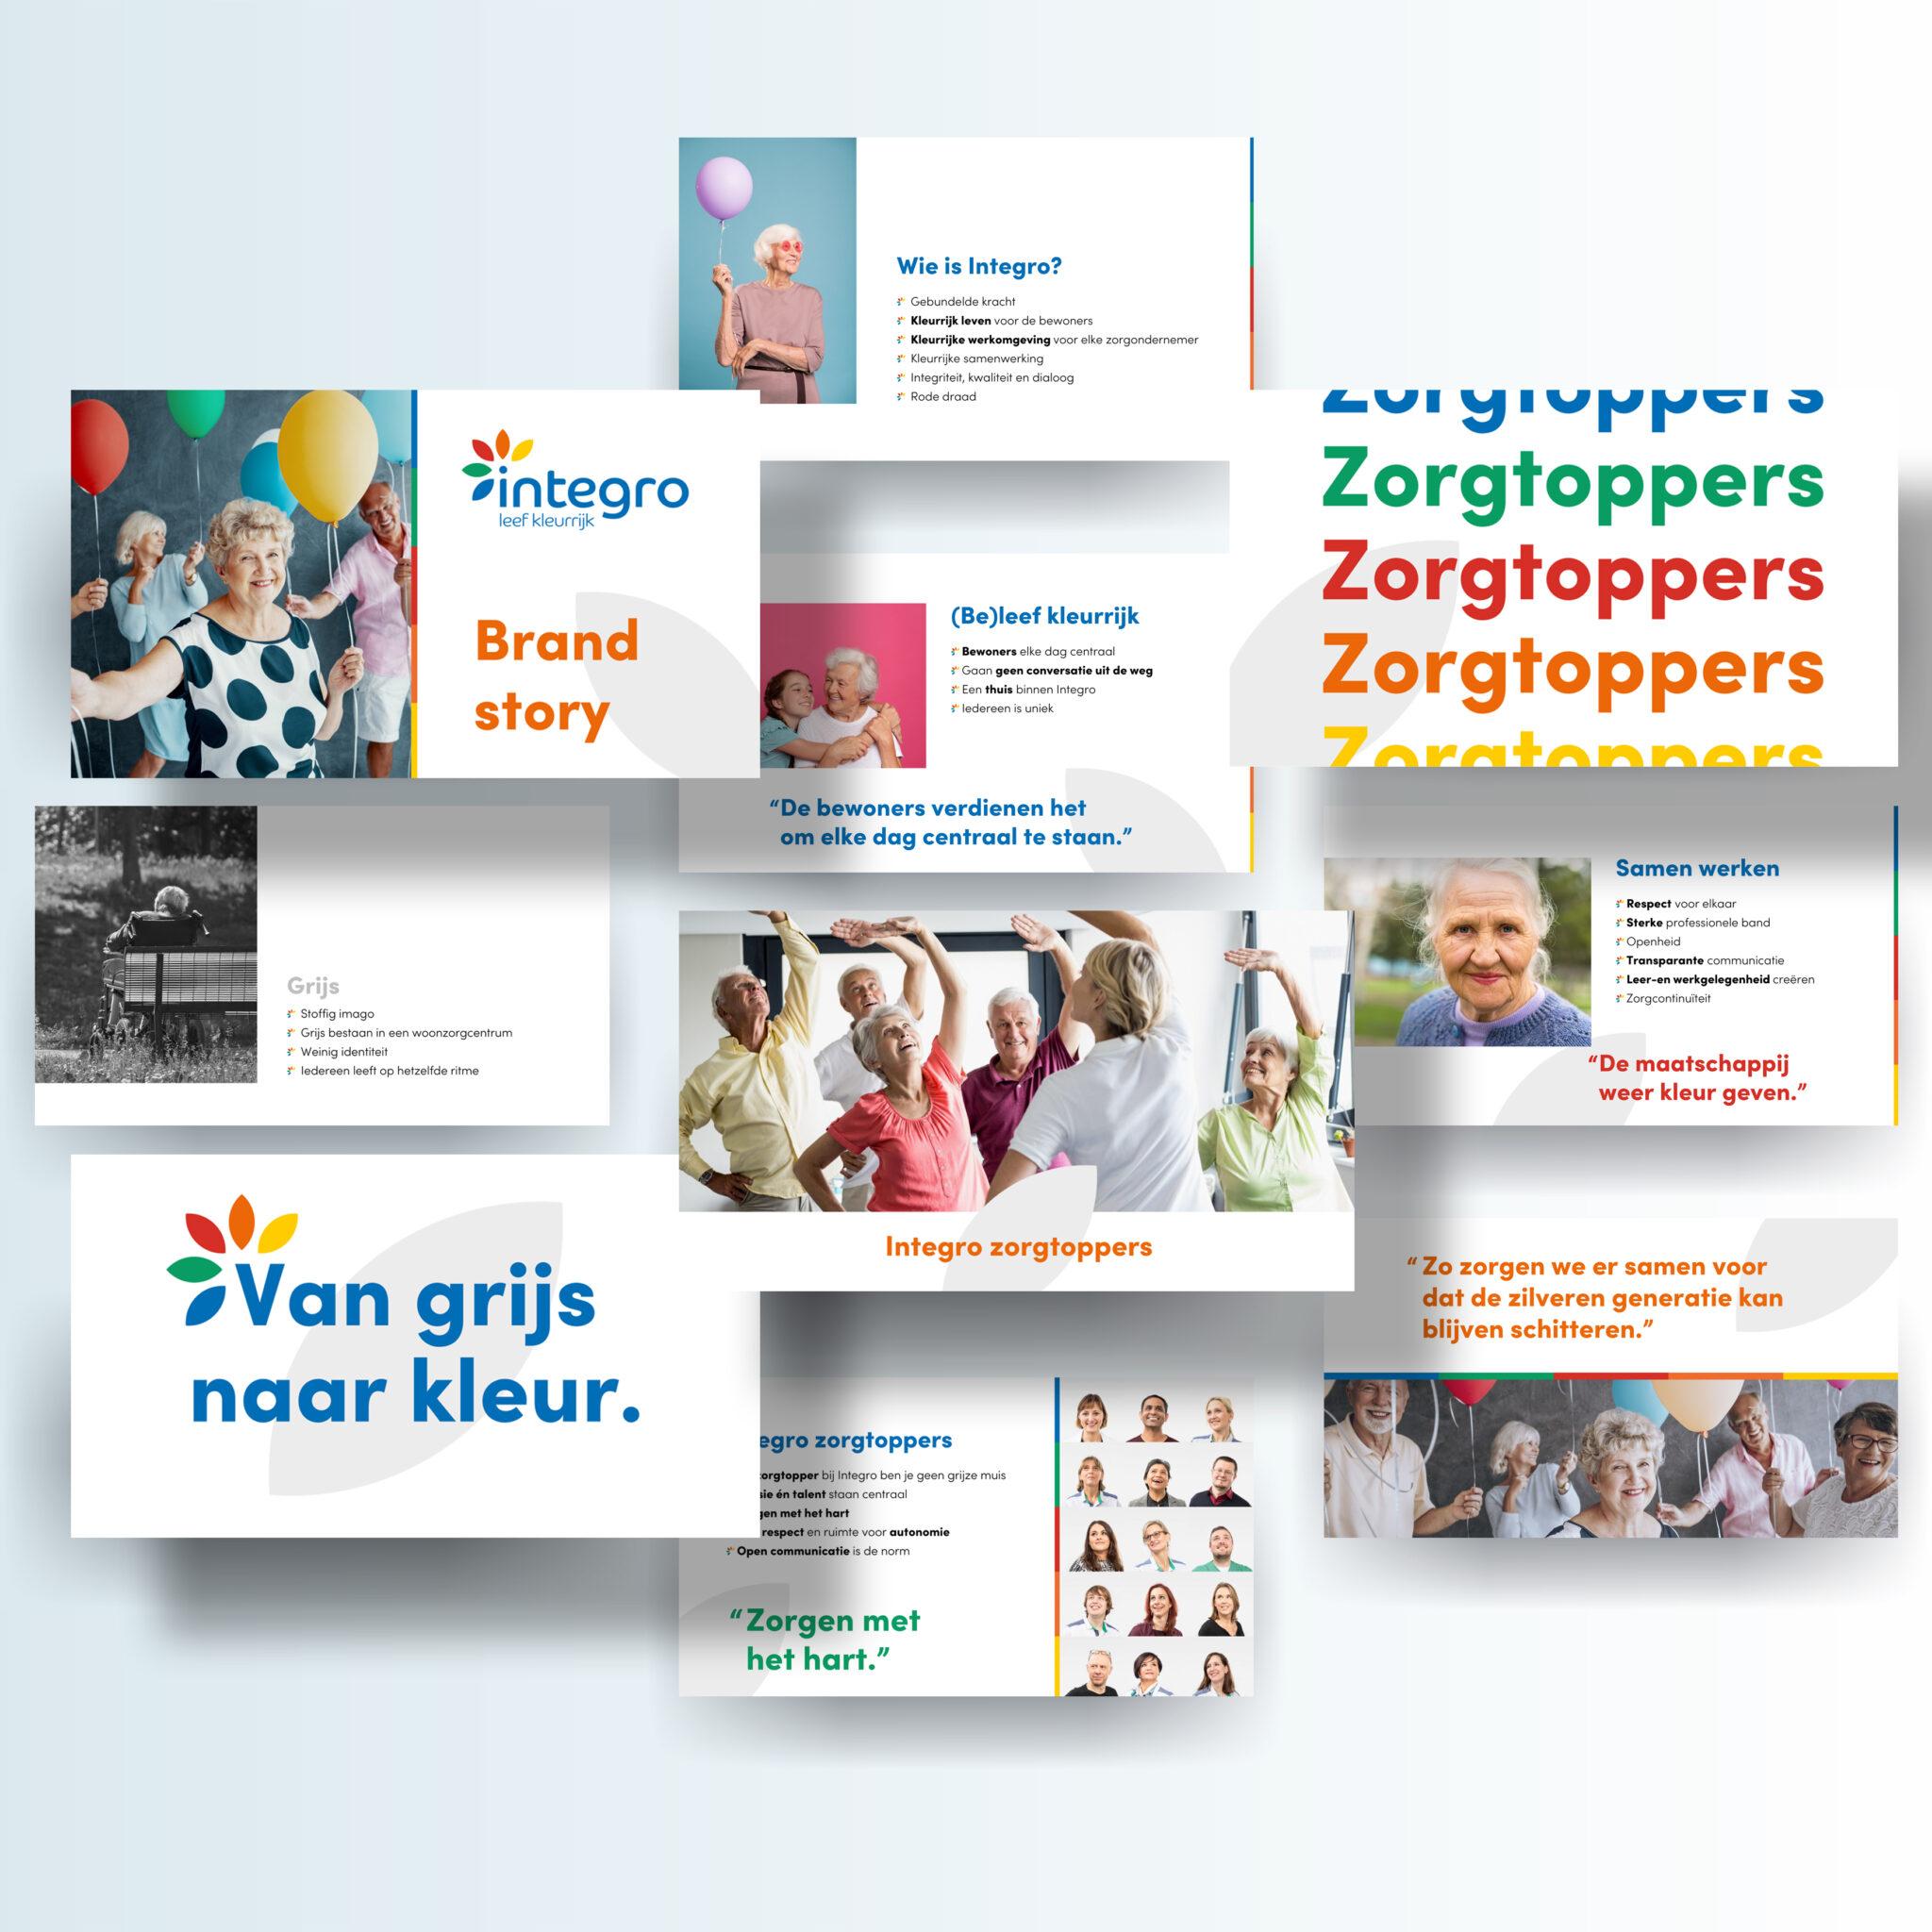 Brand story Integro